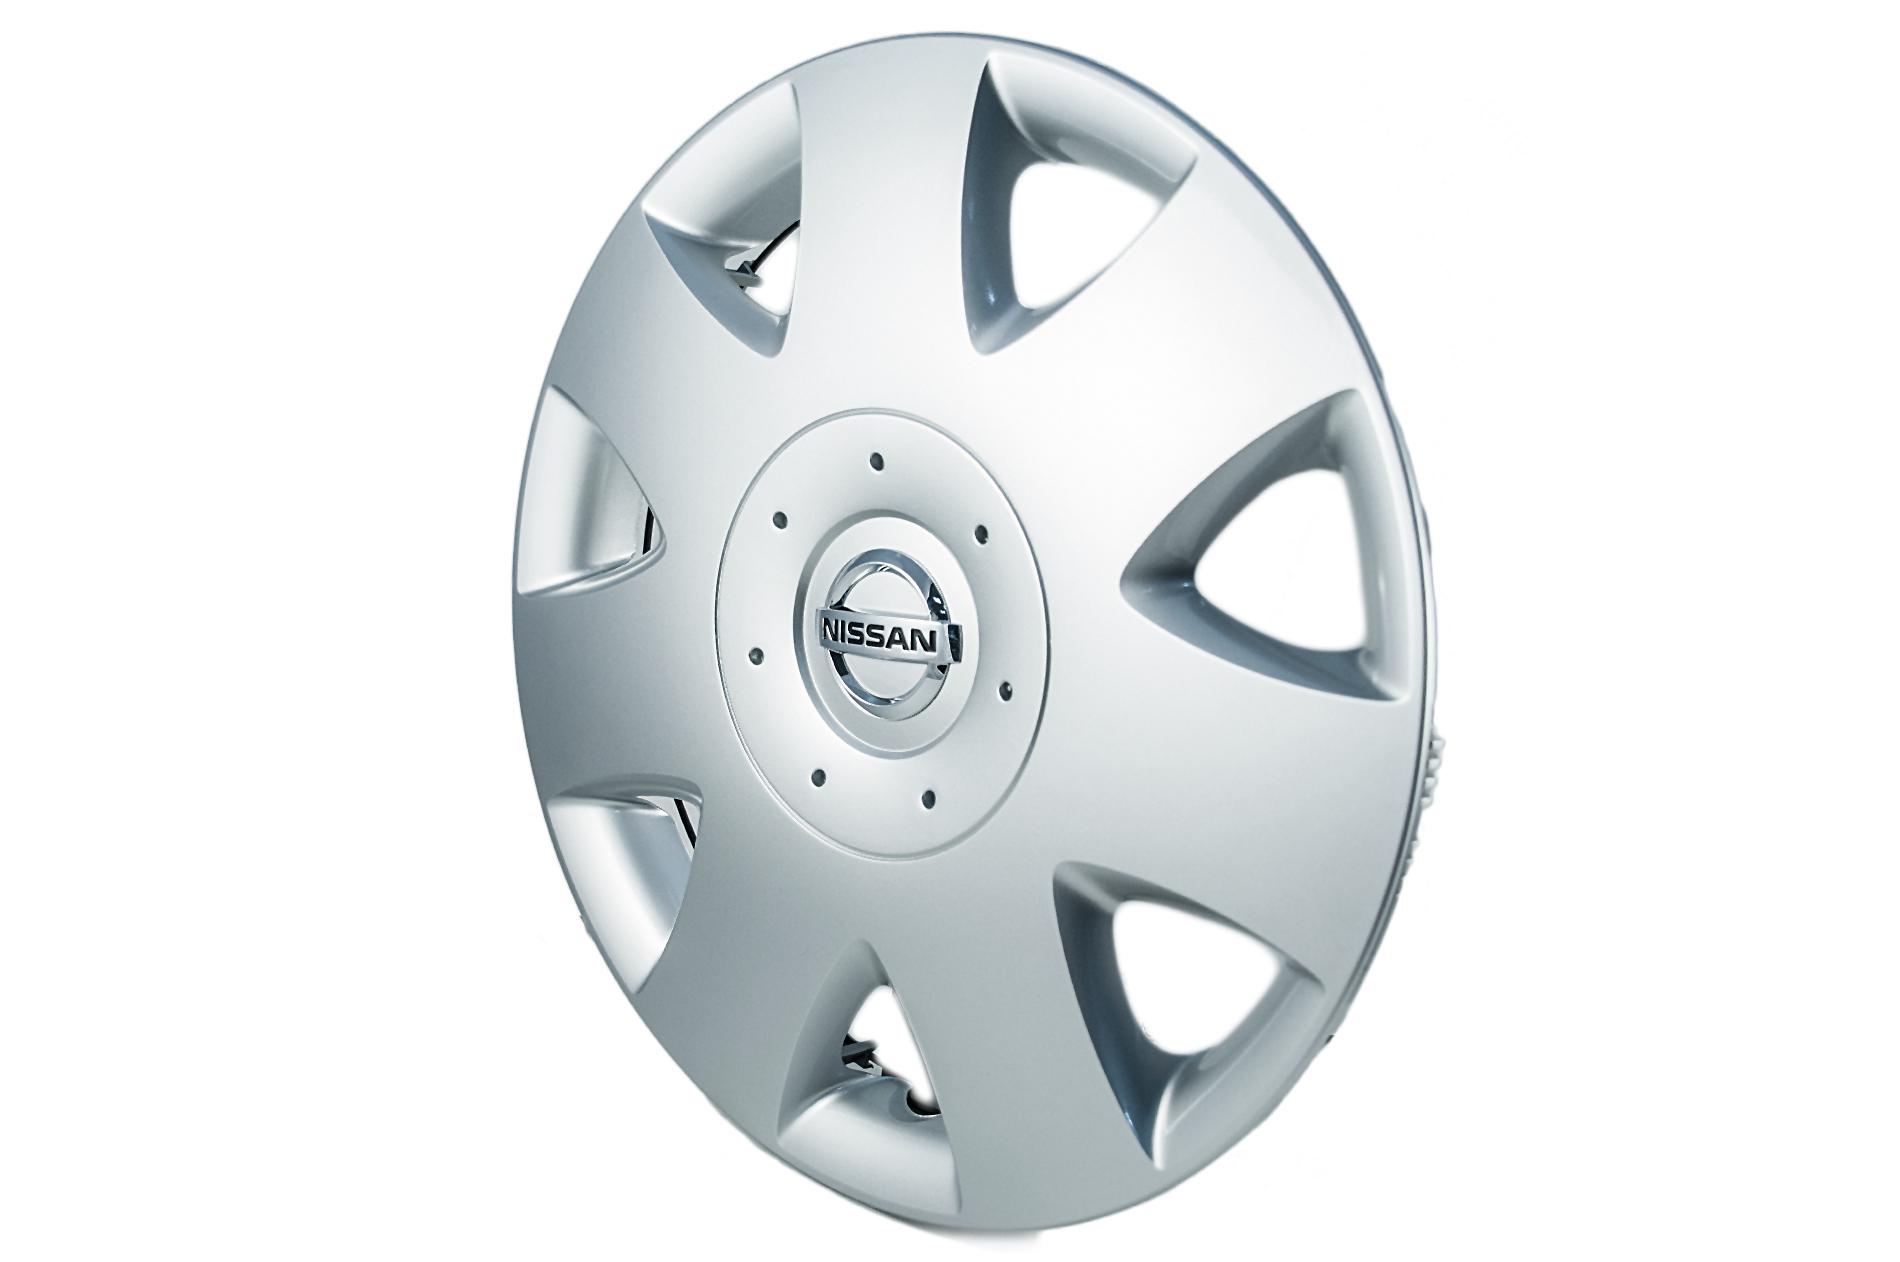 Nissan Genuine Primera P12e Car Hubcap Hub Cap Wheel